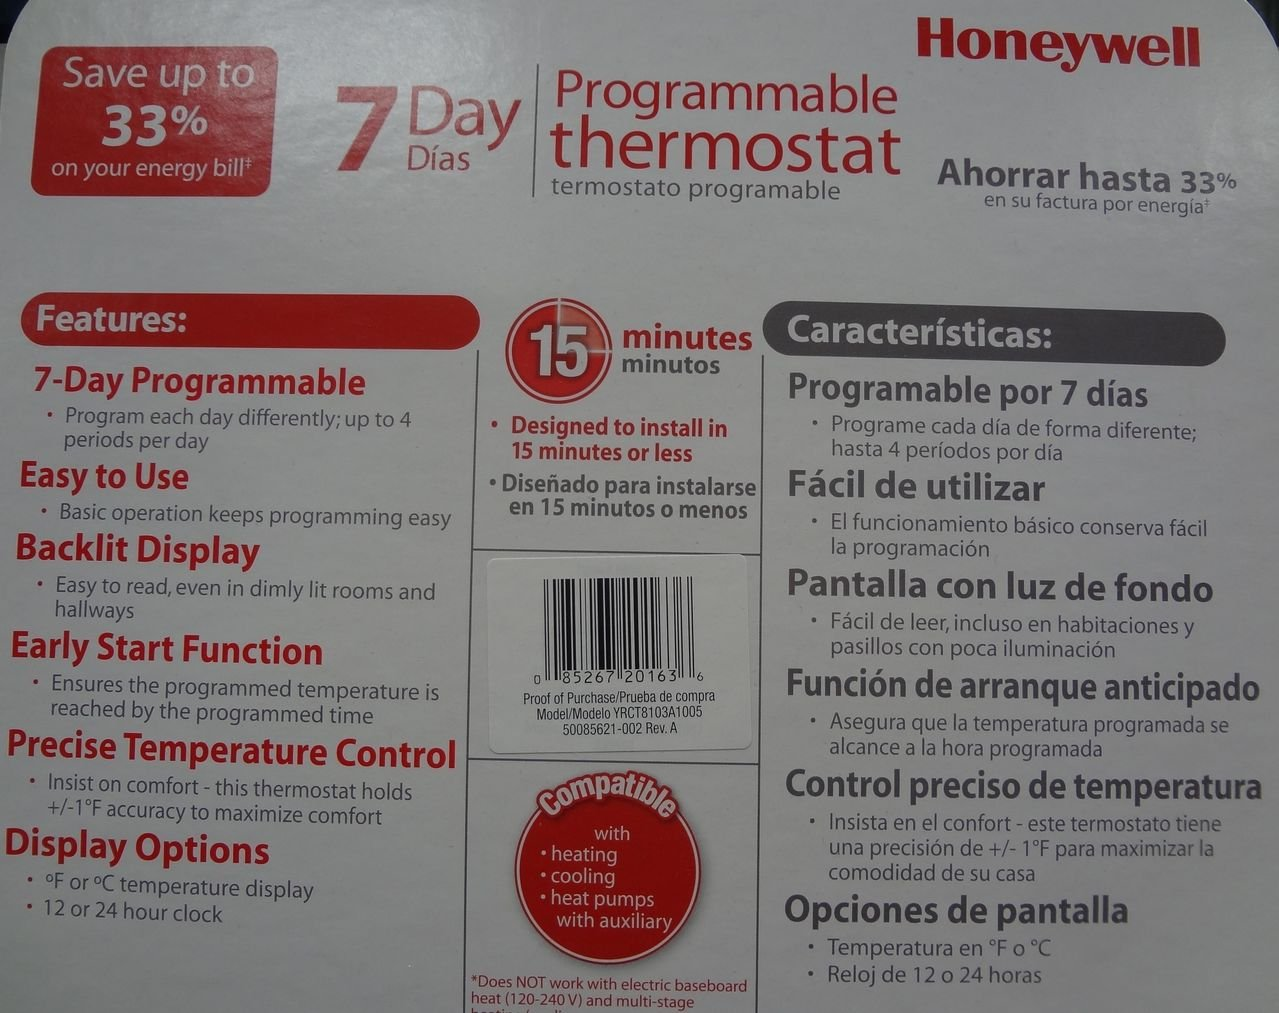 Honeywell 7 Day Programmable Thermostat - - Amazon.com